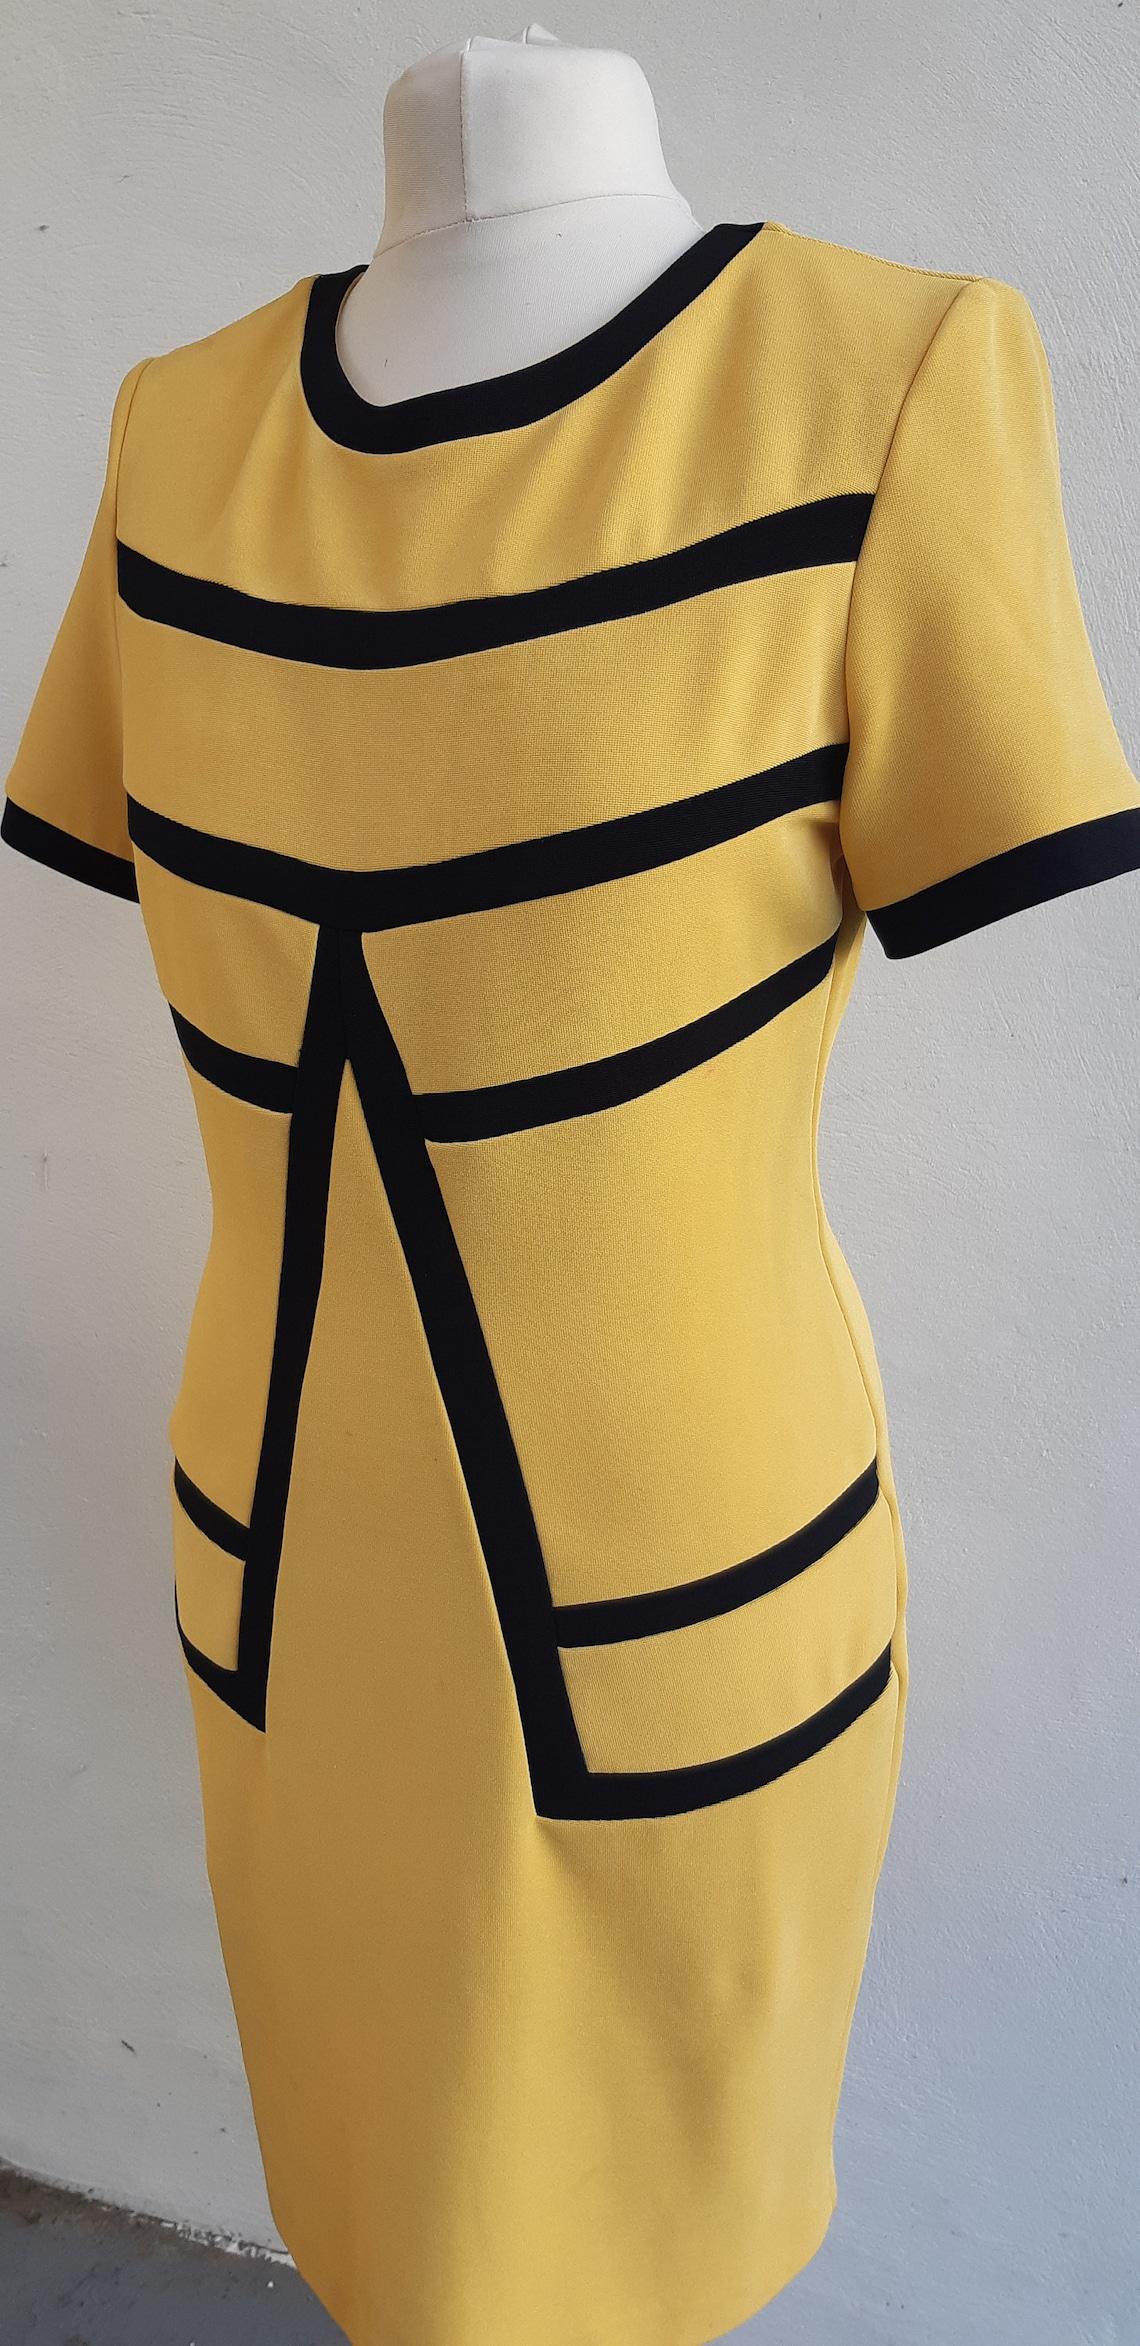 Vintage dress Joseph Ribkoff Creations 90s yellow lemon dress